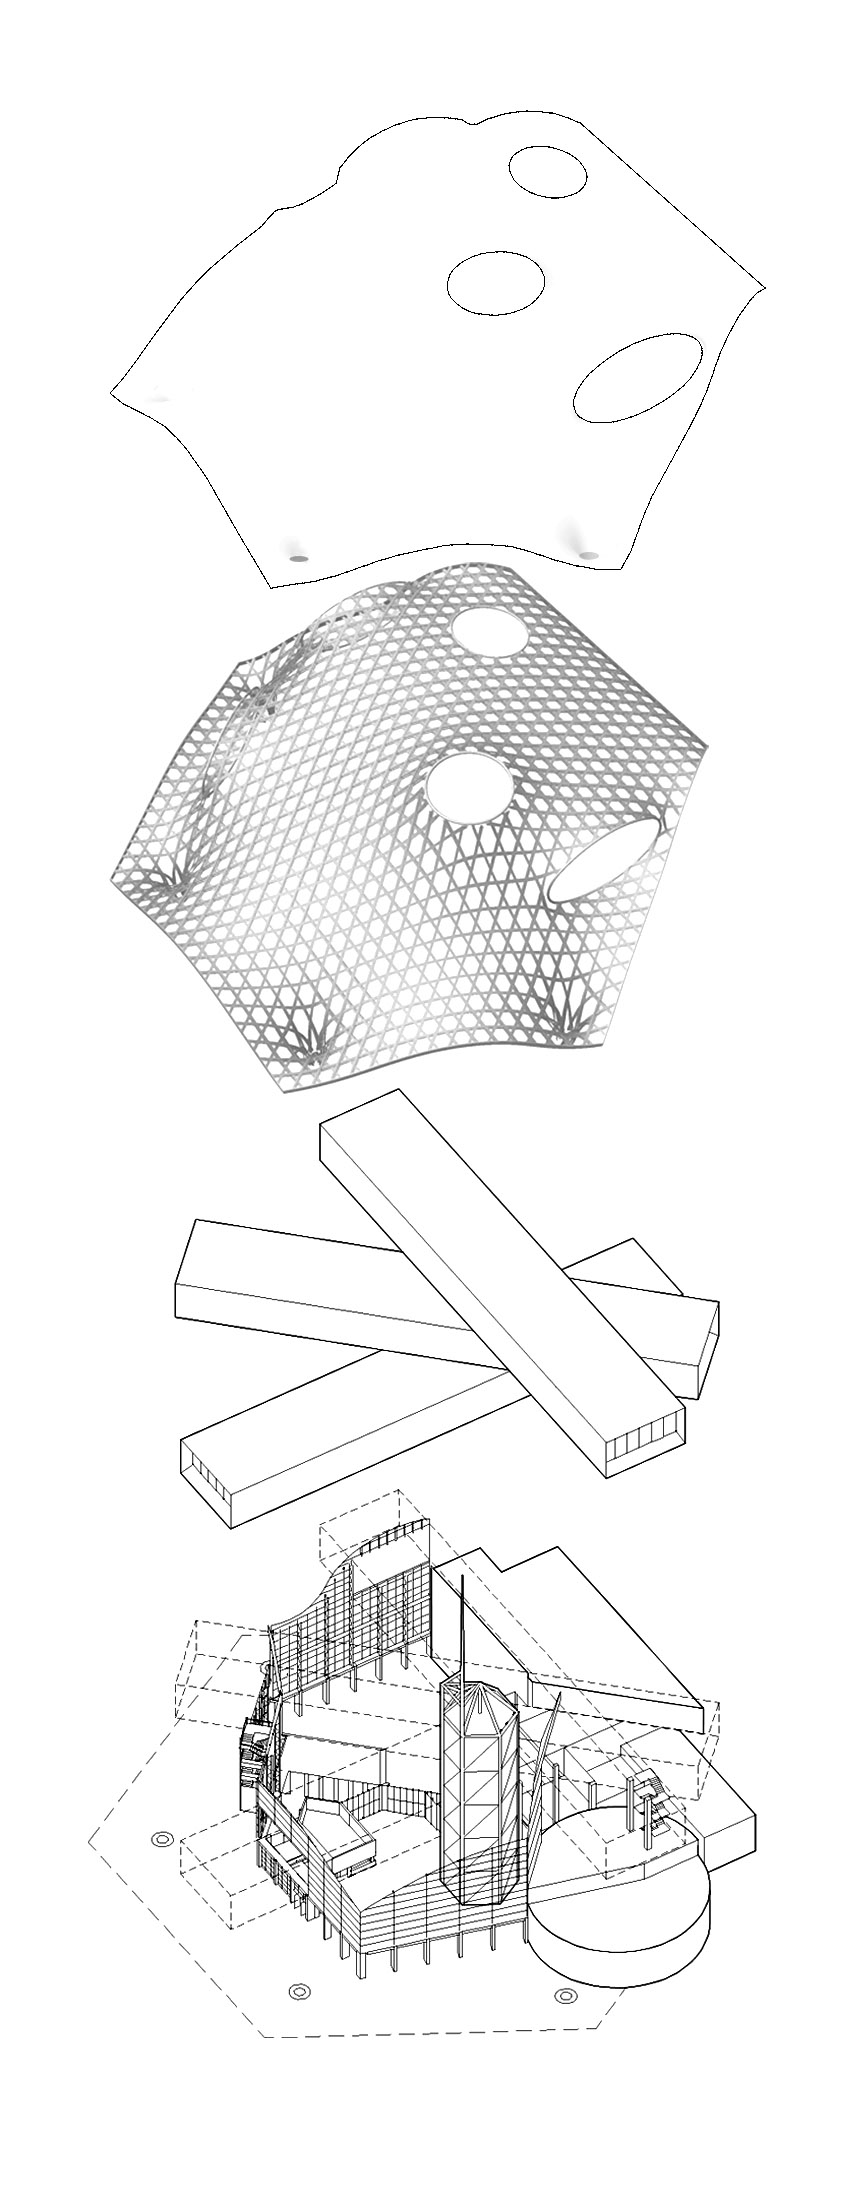 09_centro Pompidu Metz_axonometría